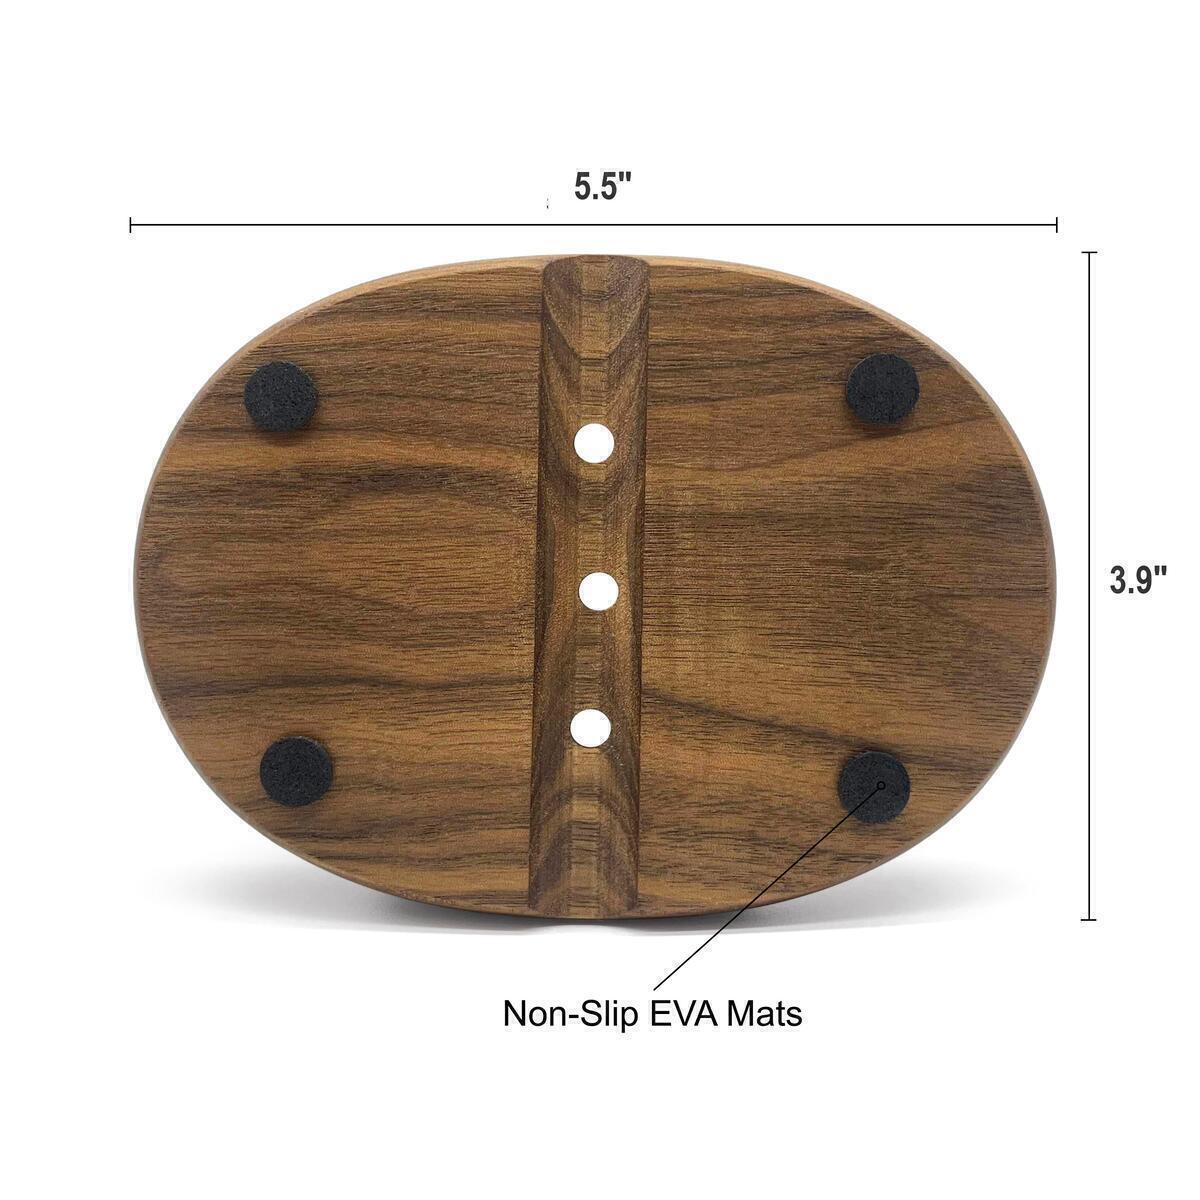 Walnut Wooden Soap Dish - Stylish Oval Design Bar Soap Holder